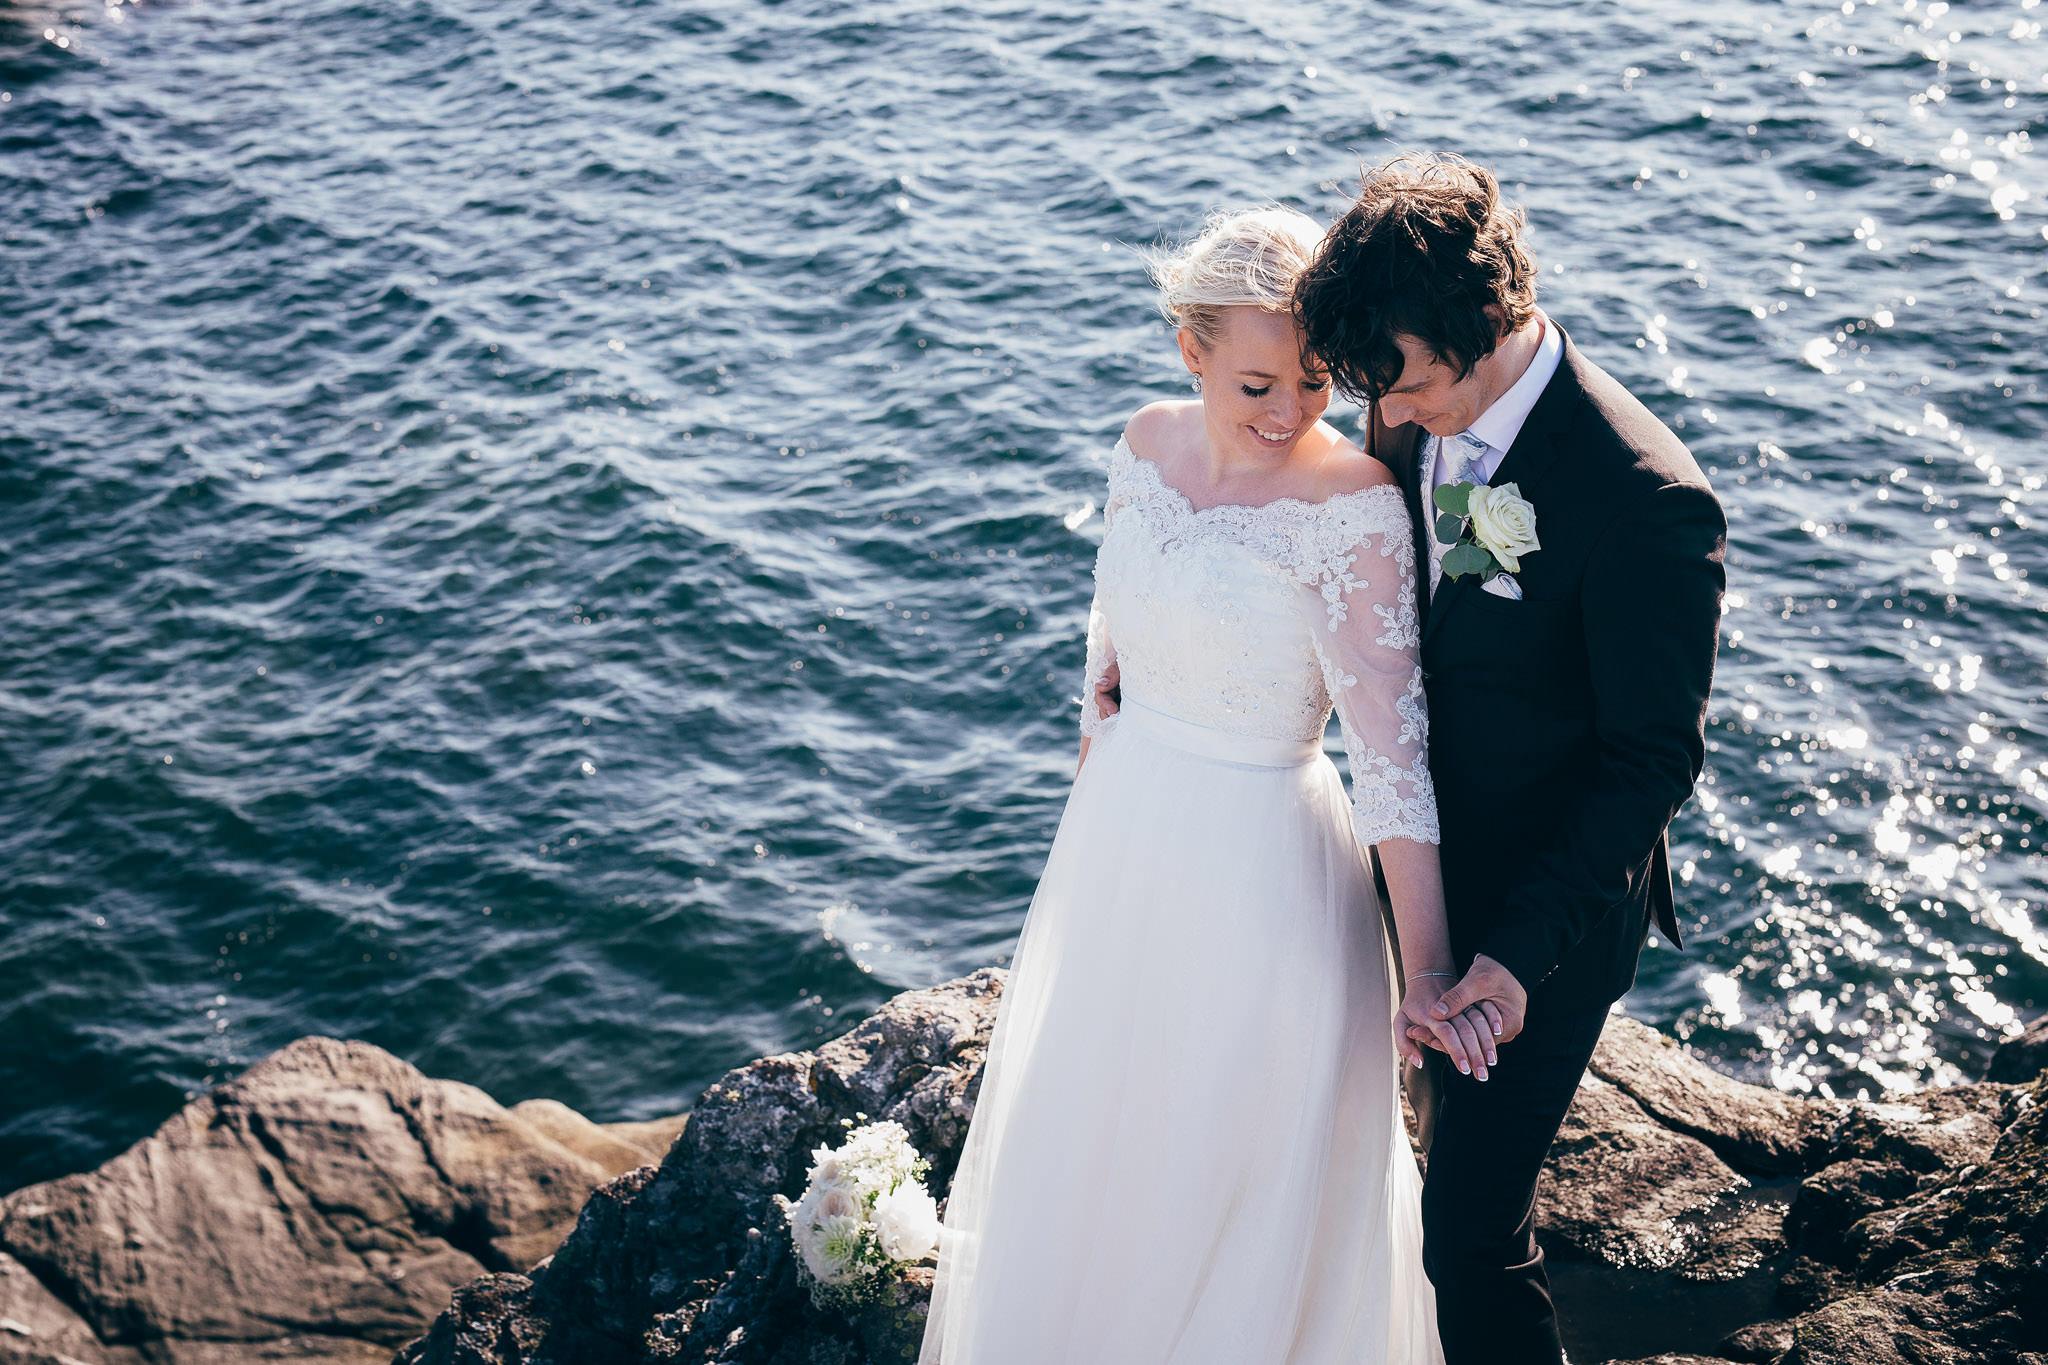 Wedding+Photographer+Norway+Bryllupsfotograf+Casey+Arneson+JT-126.jpg